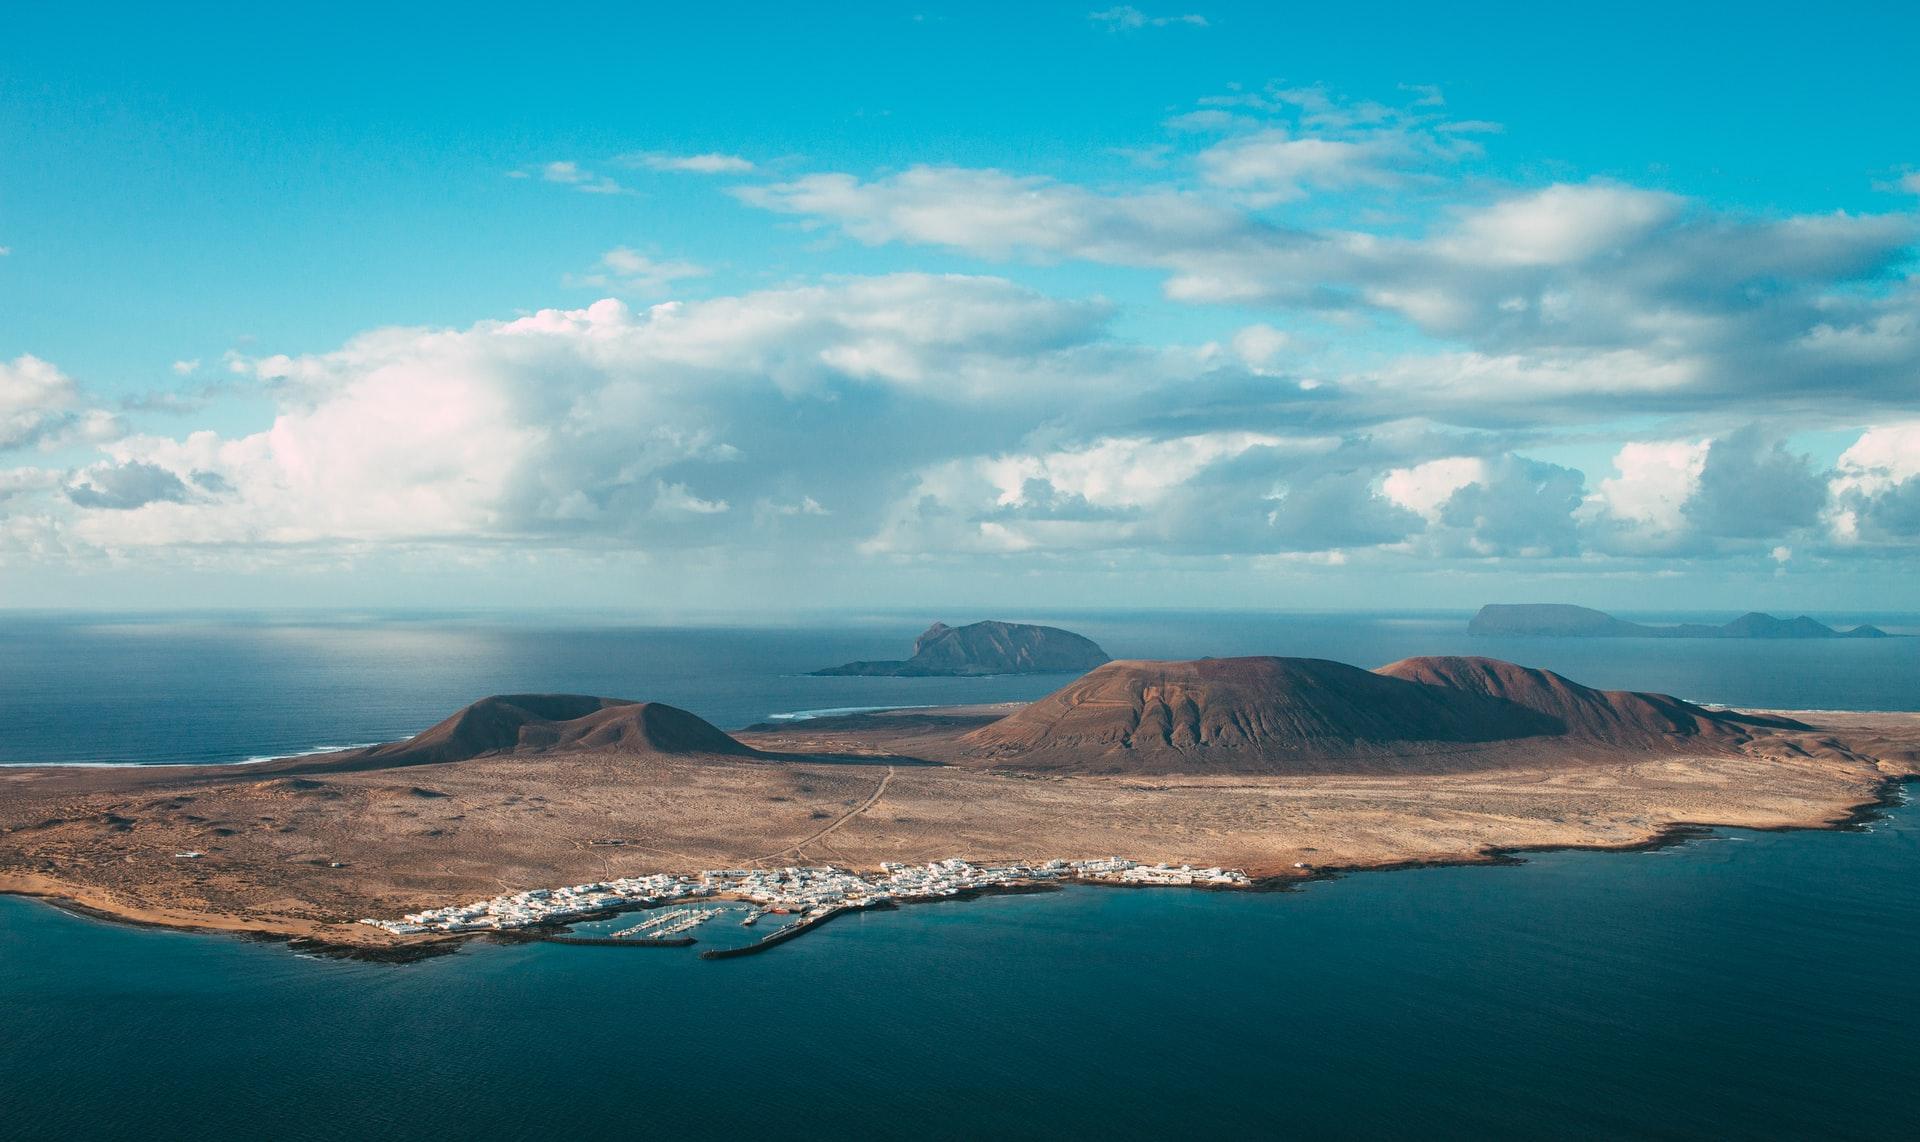 Vulkaninsel Lanzarote Kanaren